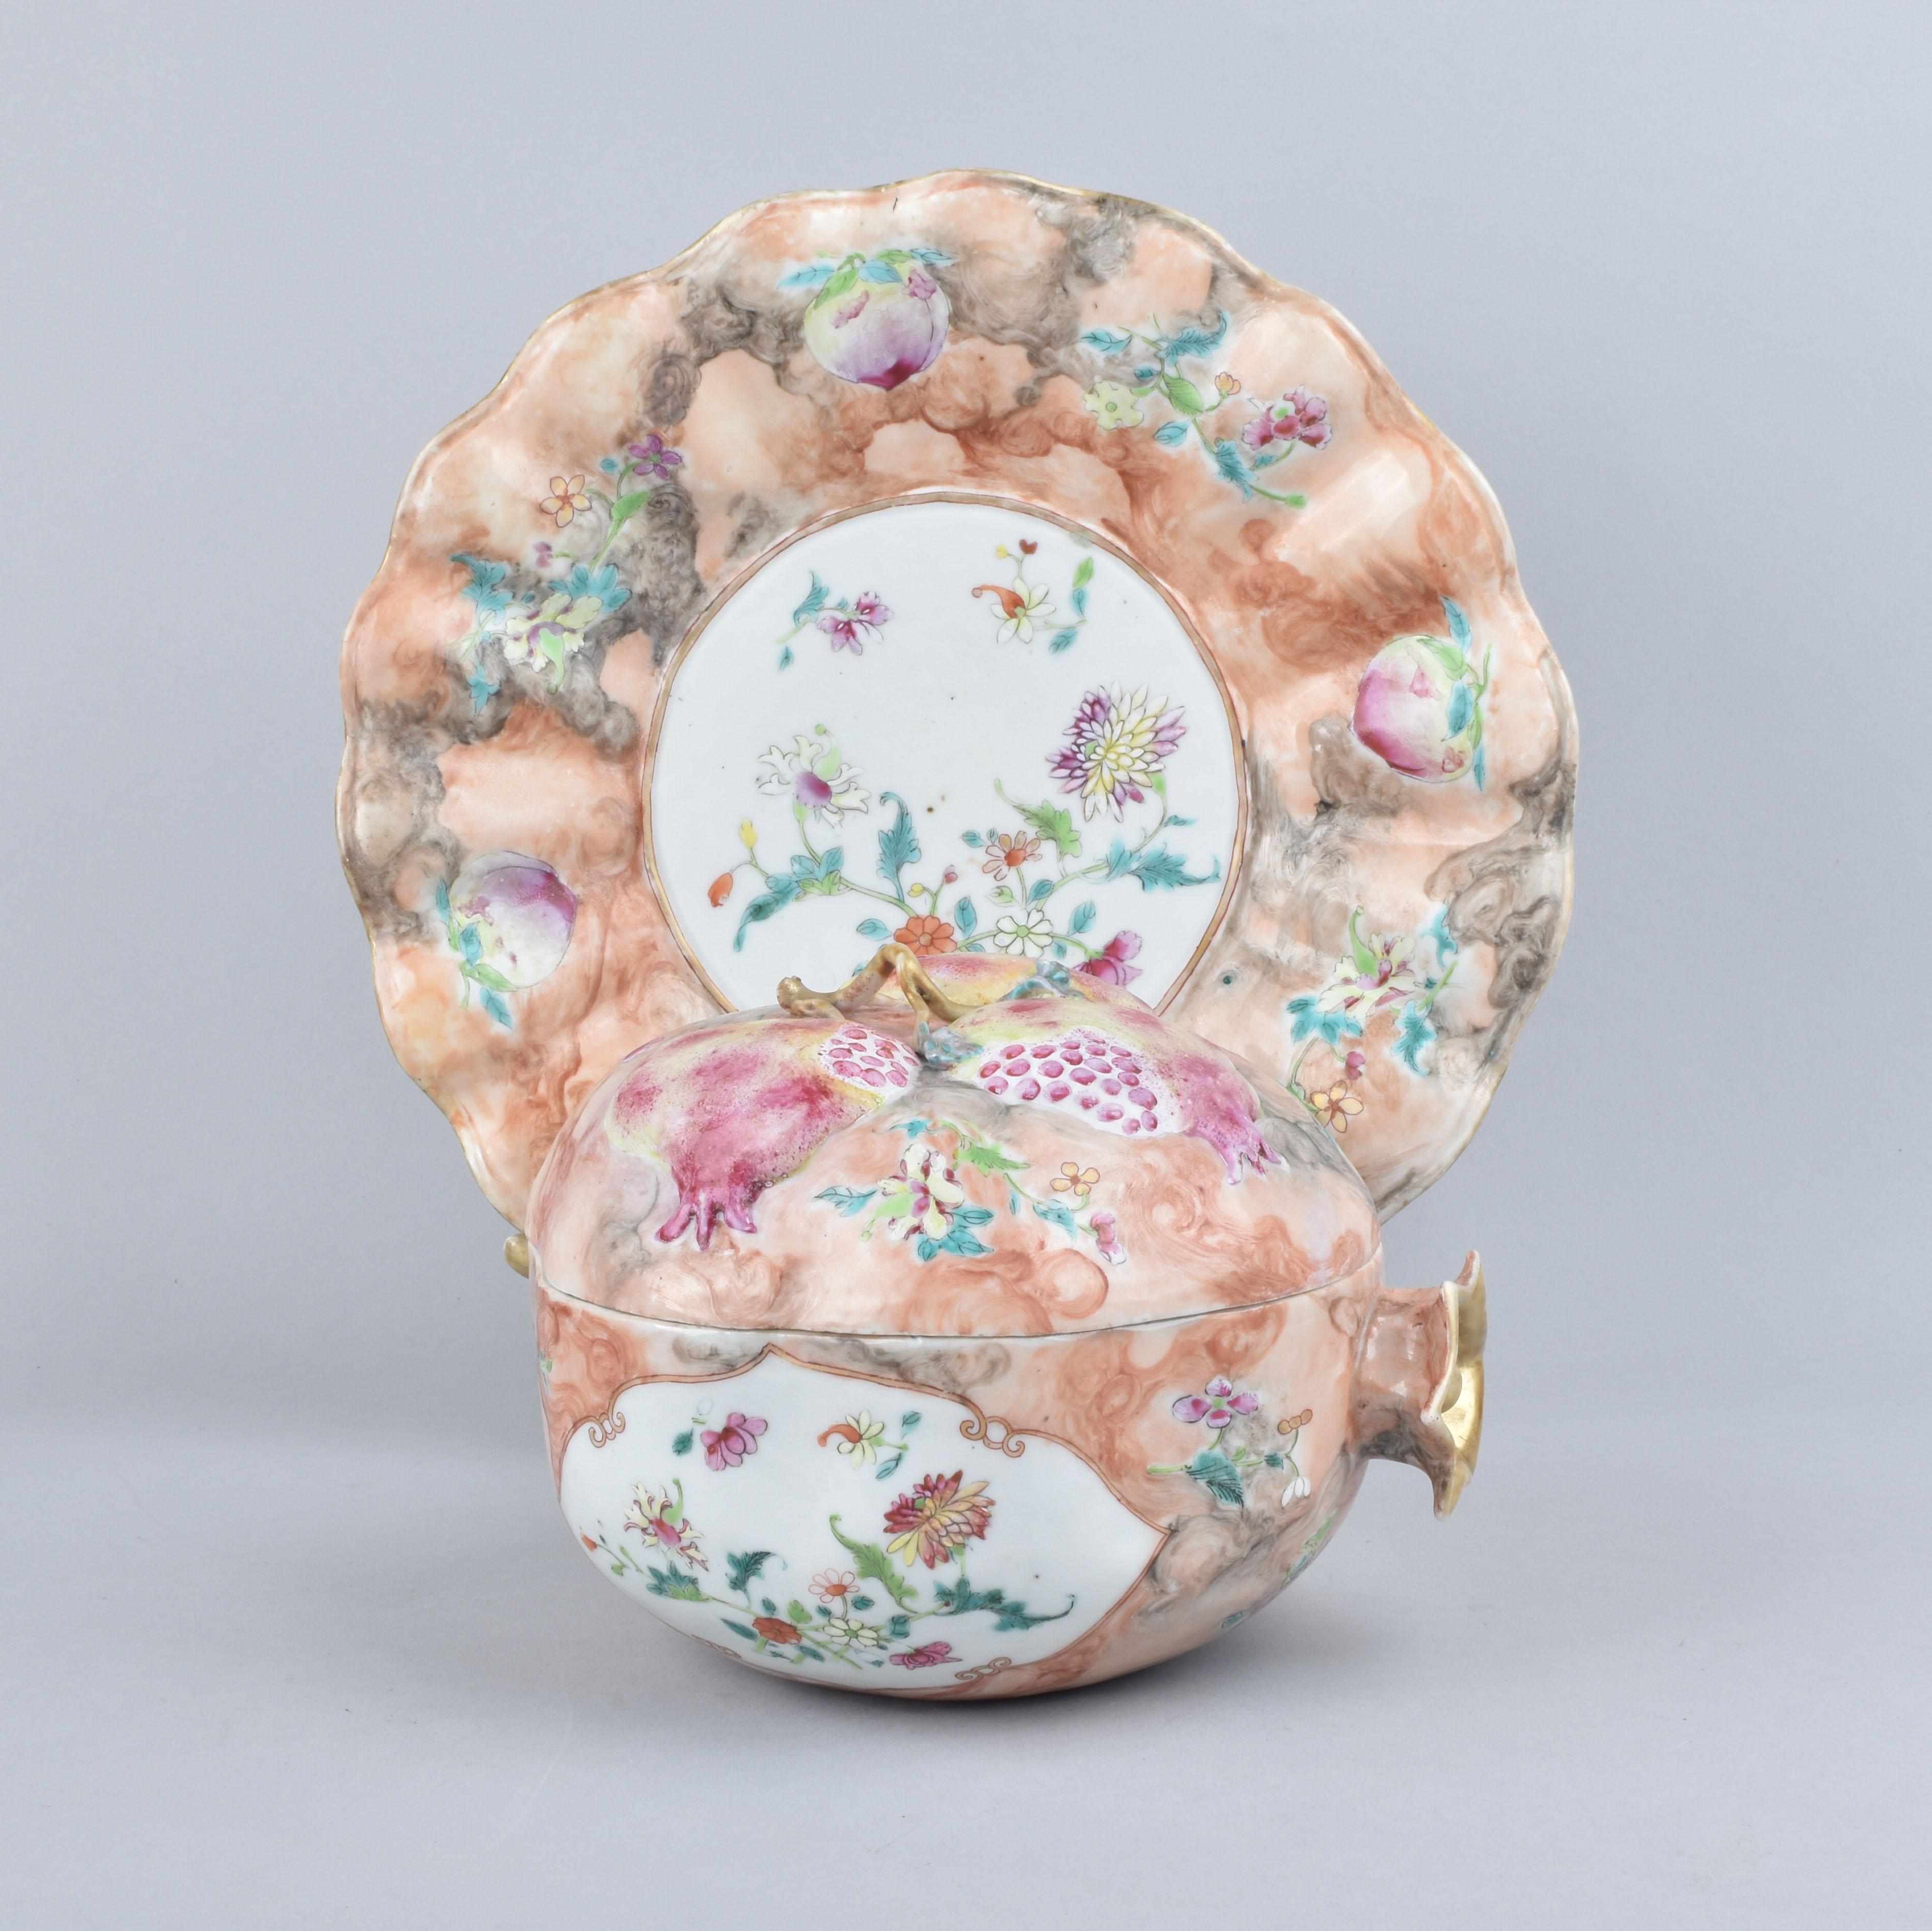 Porcelaine Qianlong (1735-1795), circa 1755, Chine